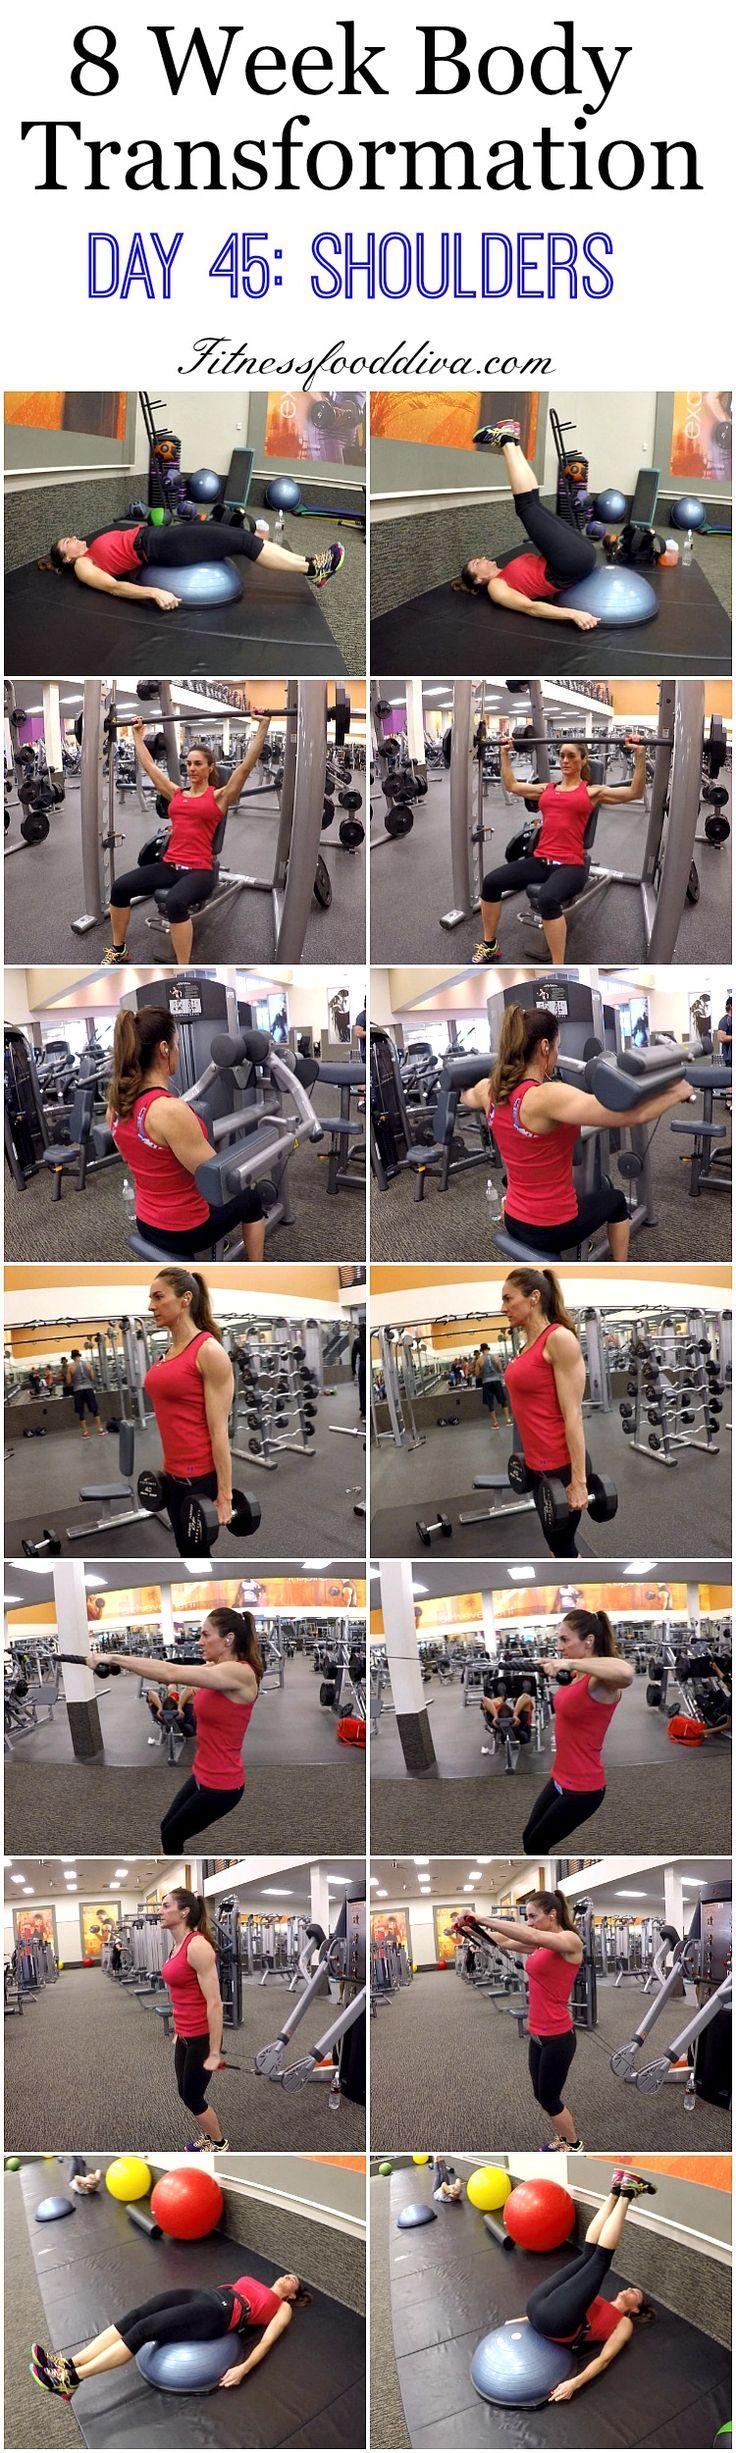 8 Week Body Transformation: Day 45 SHOULDERS.